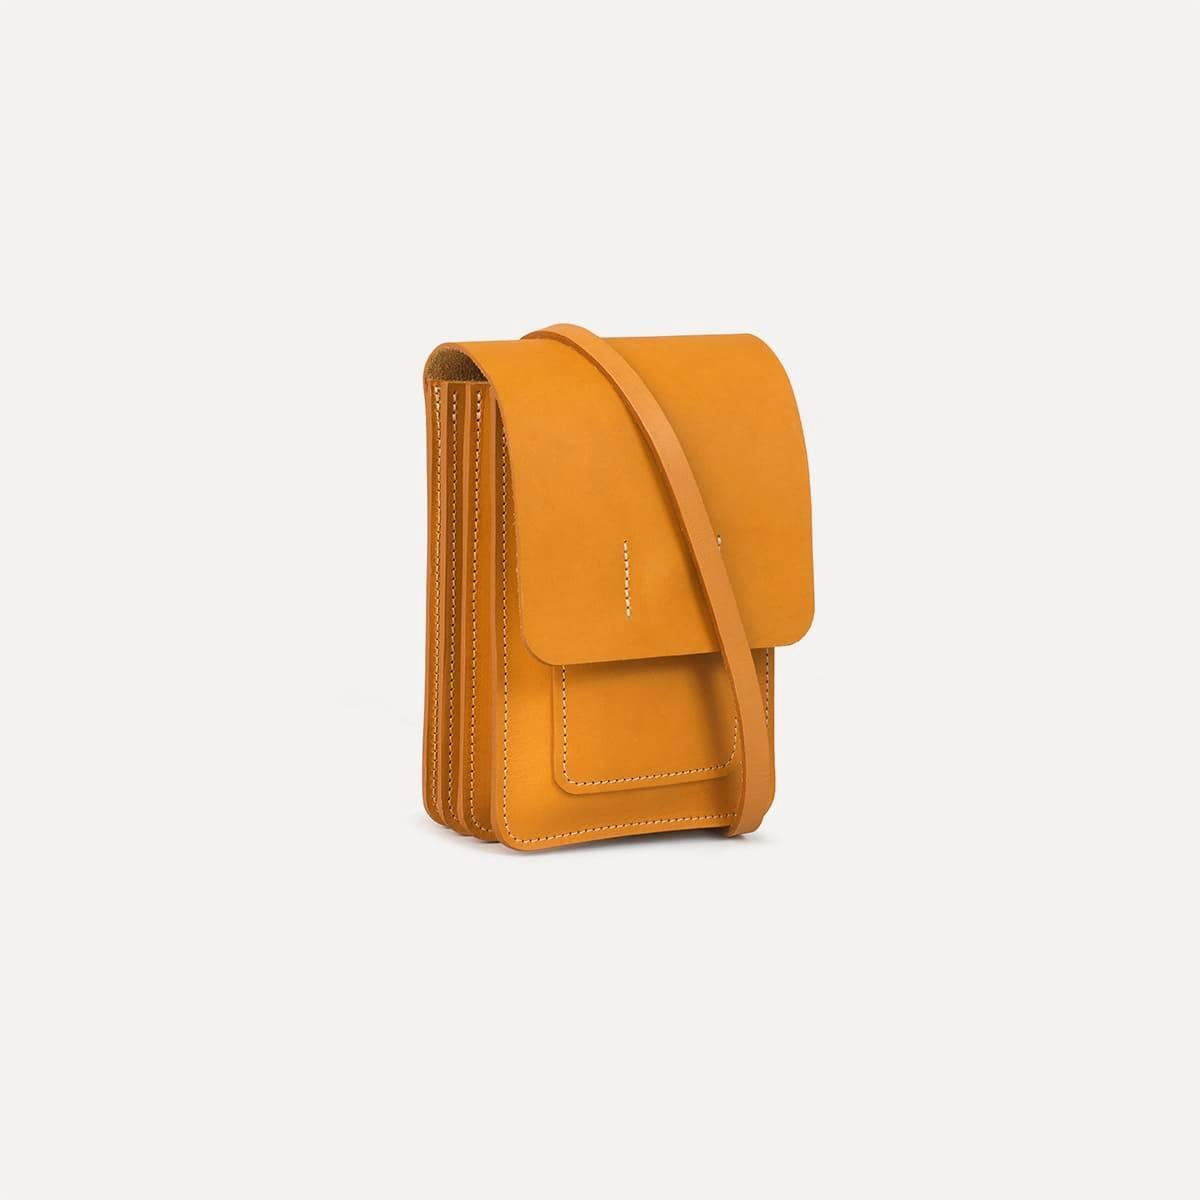 Jeweler's bag - BDC x Atelier Paulin (image n°3)